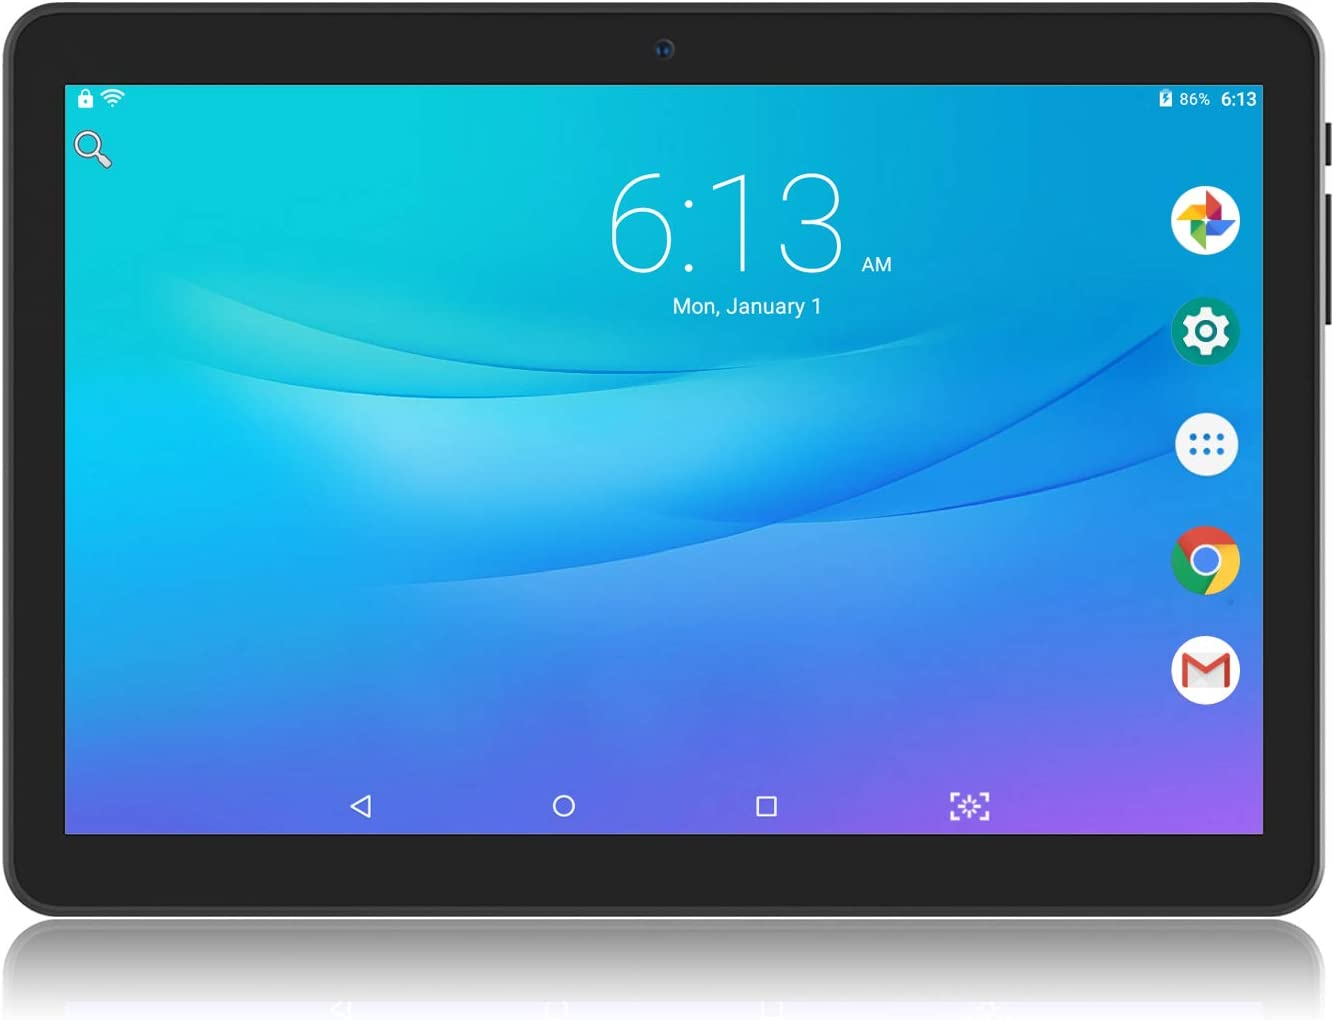 Lectrus Tablet 10 inch Android 9.0 Oreo, 2GB+32GB WiFi Tablet PC, Dual Camera, Quad Core Processor, 1280x800 IPS HD Display,TF Card Slot,Support OTG,USB, GPS,Bluetooth,FM